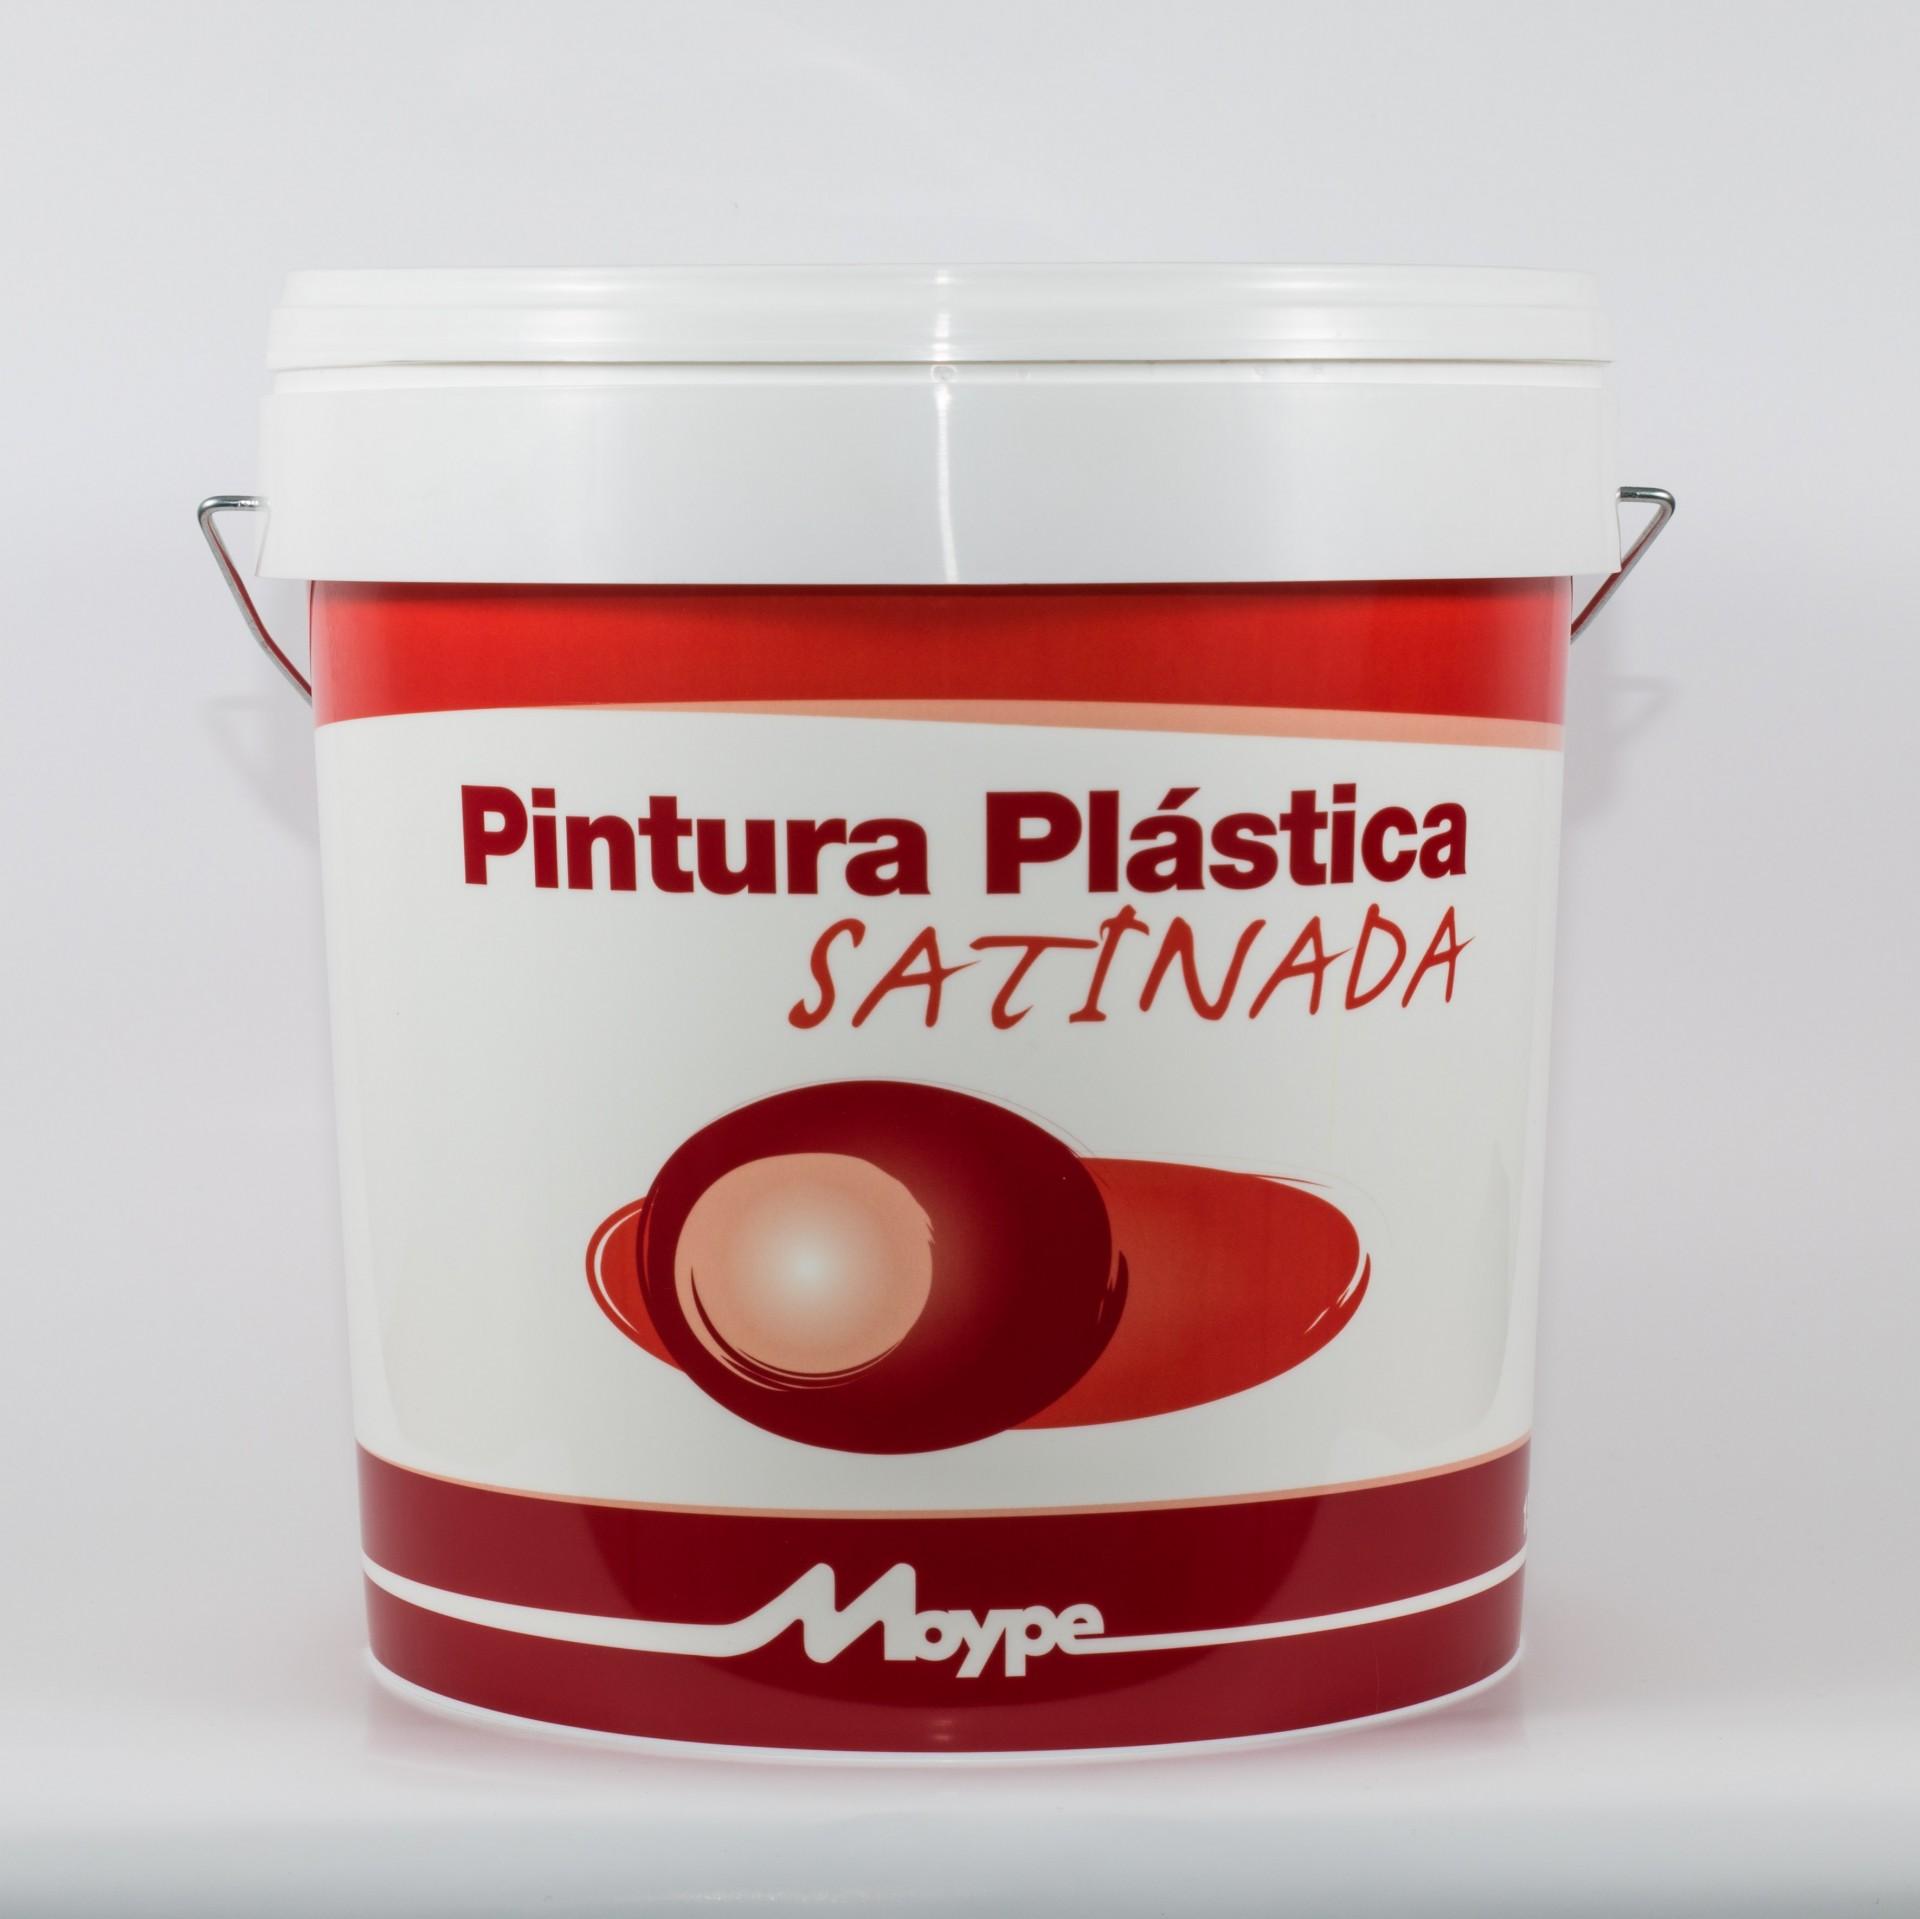 PINTURAS ACRILICA ACETINADA